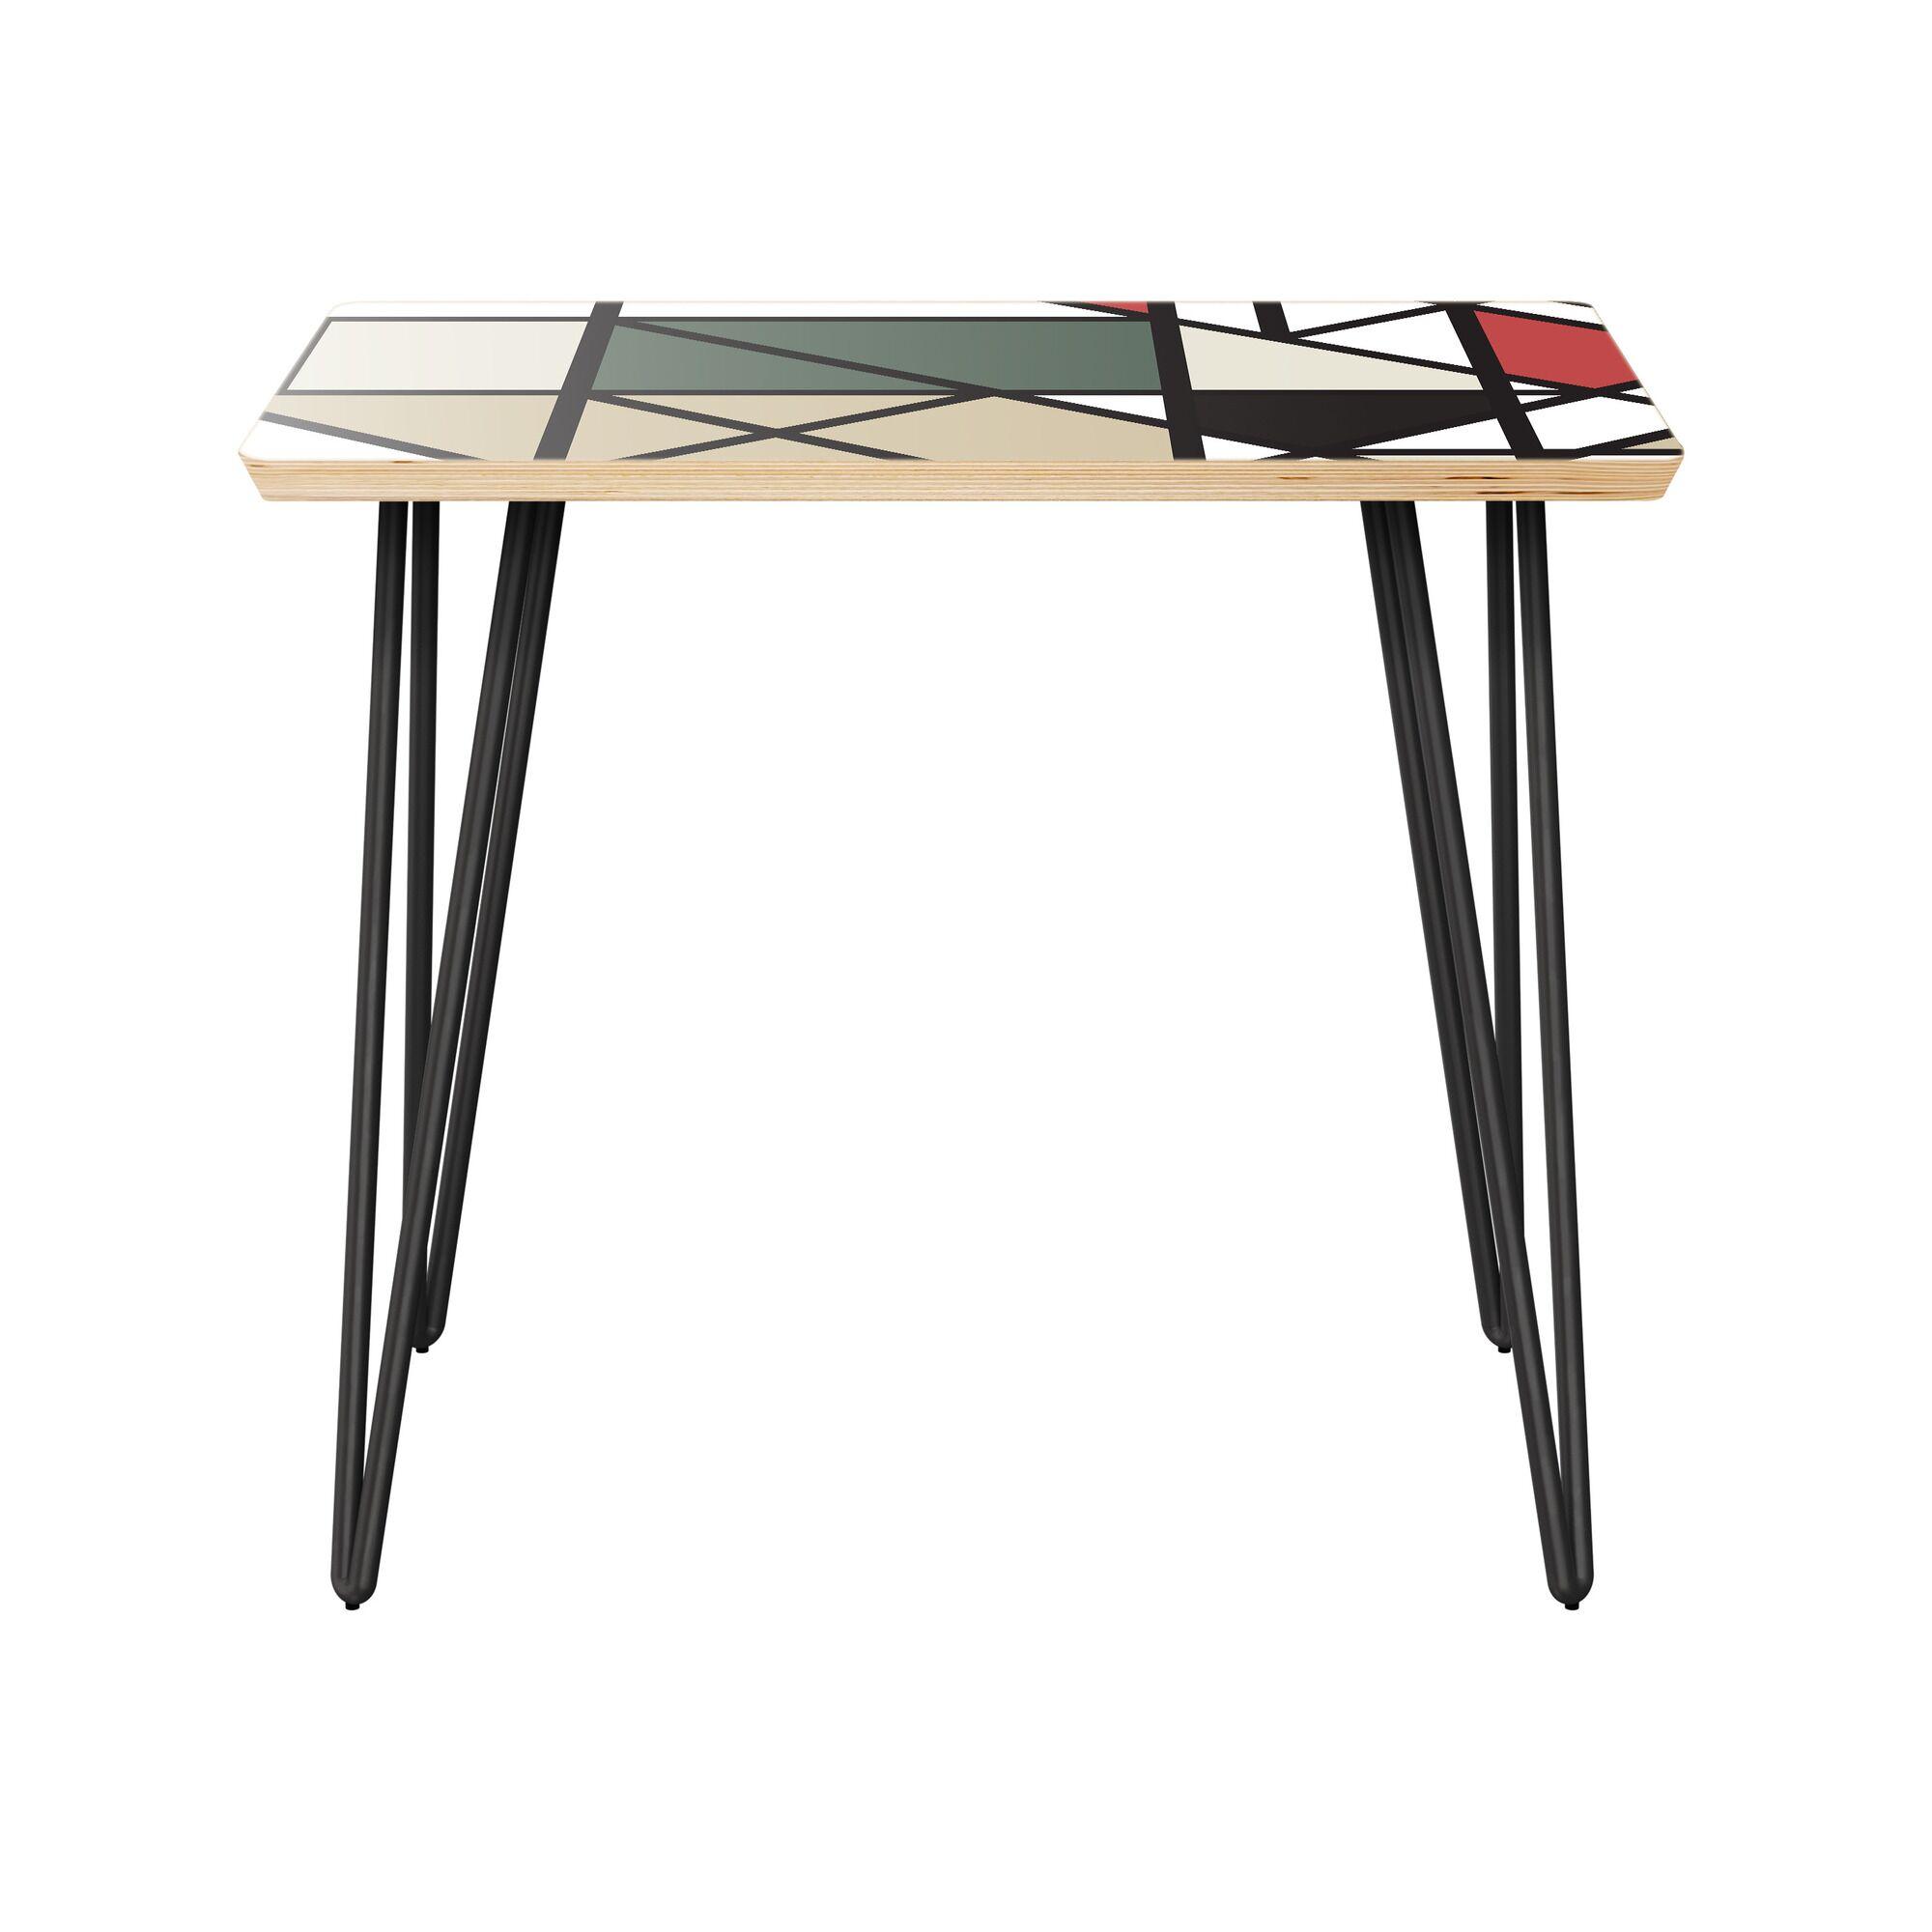 Izobel End Table Table Top Color: Natural, Table Base Color: Black